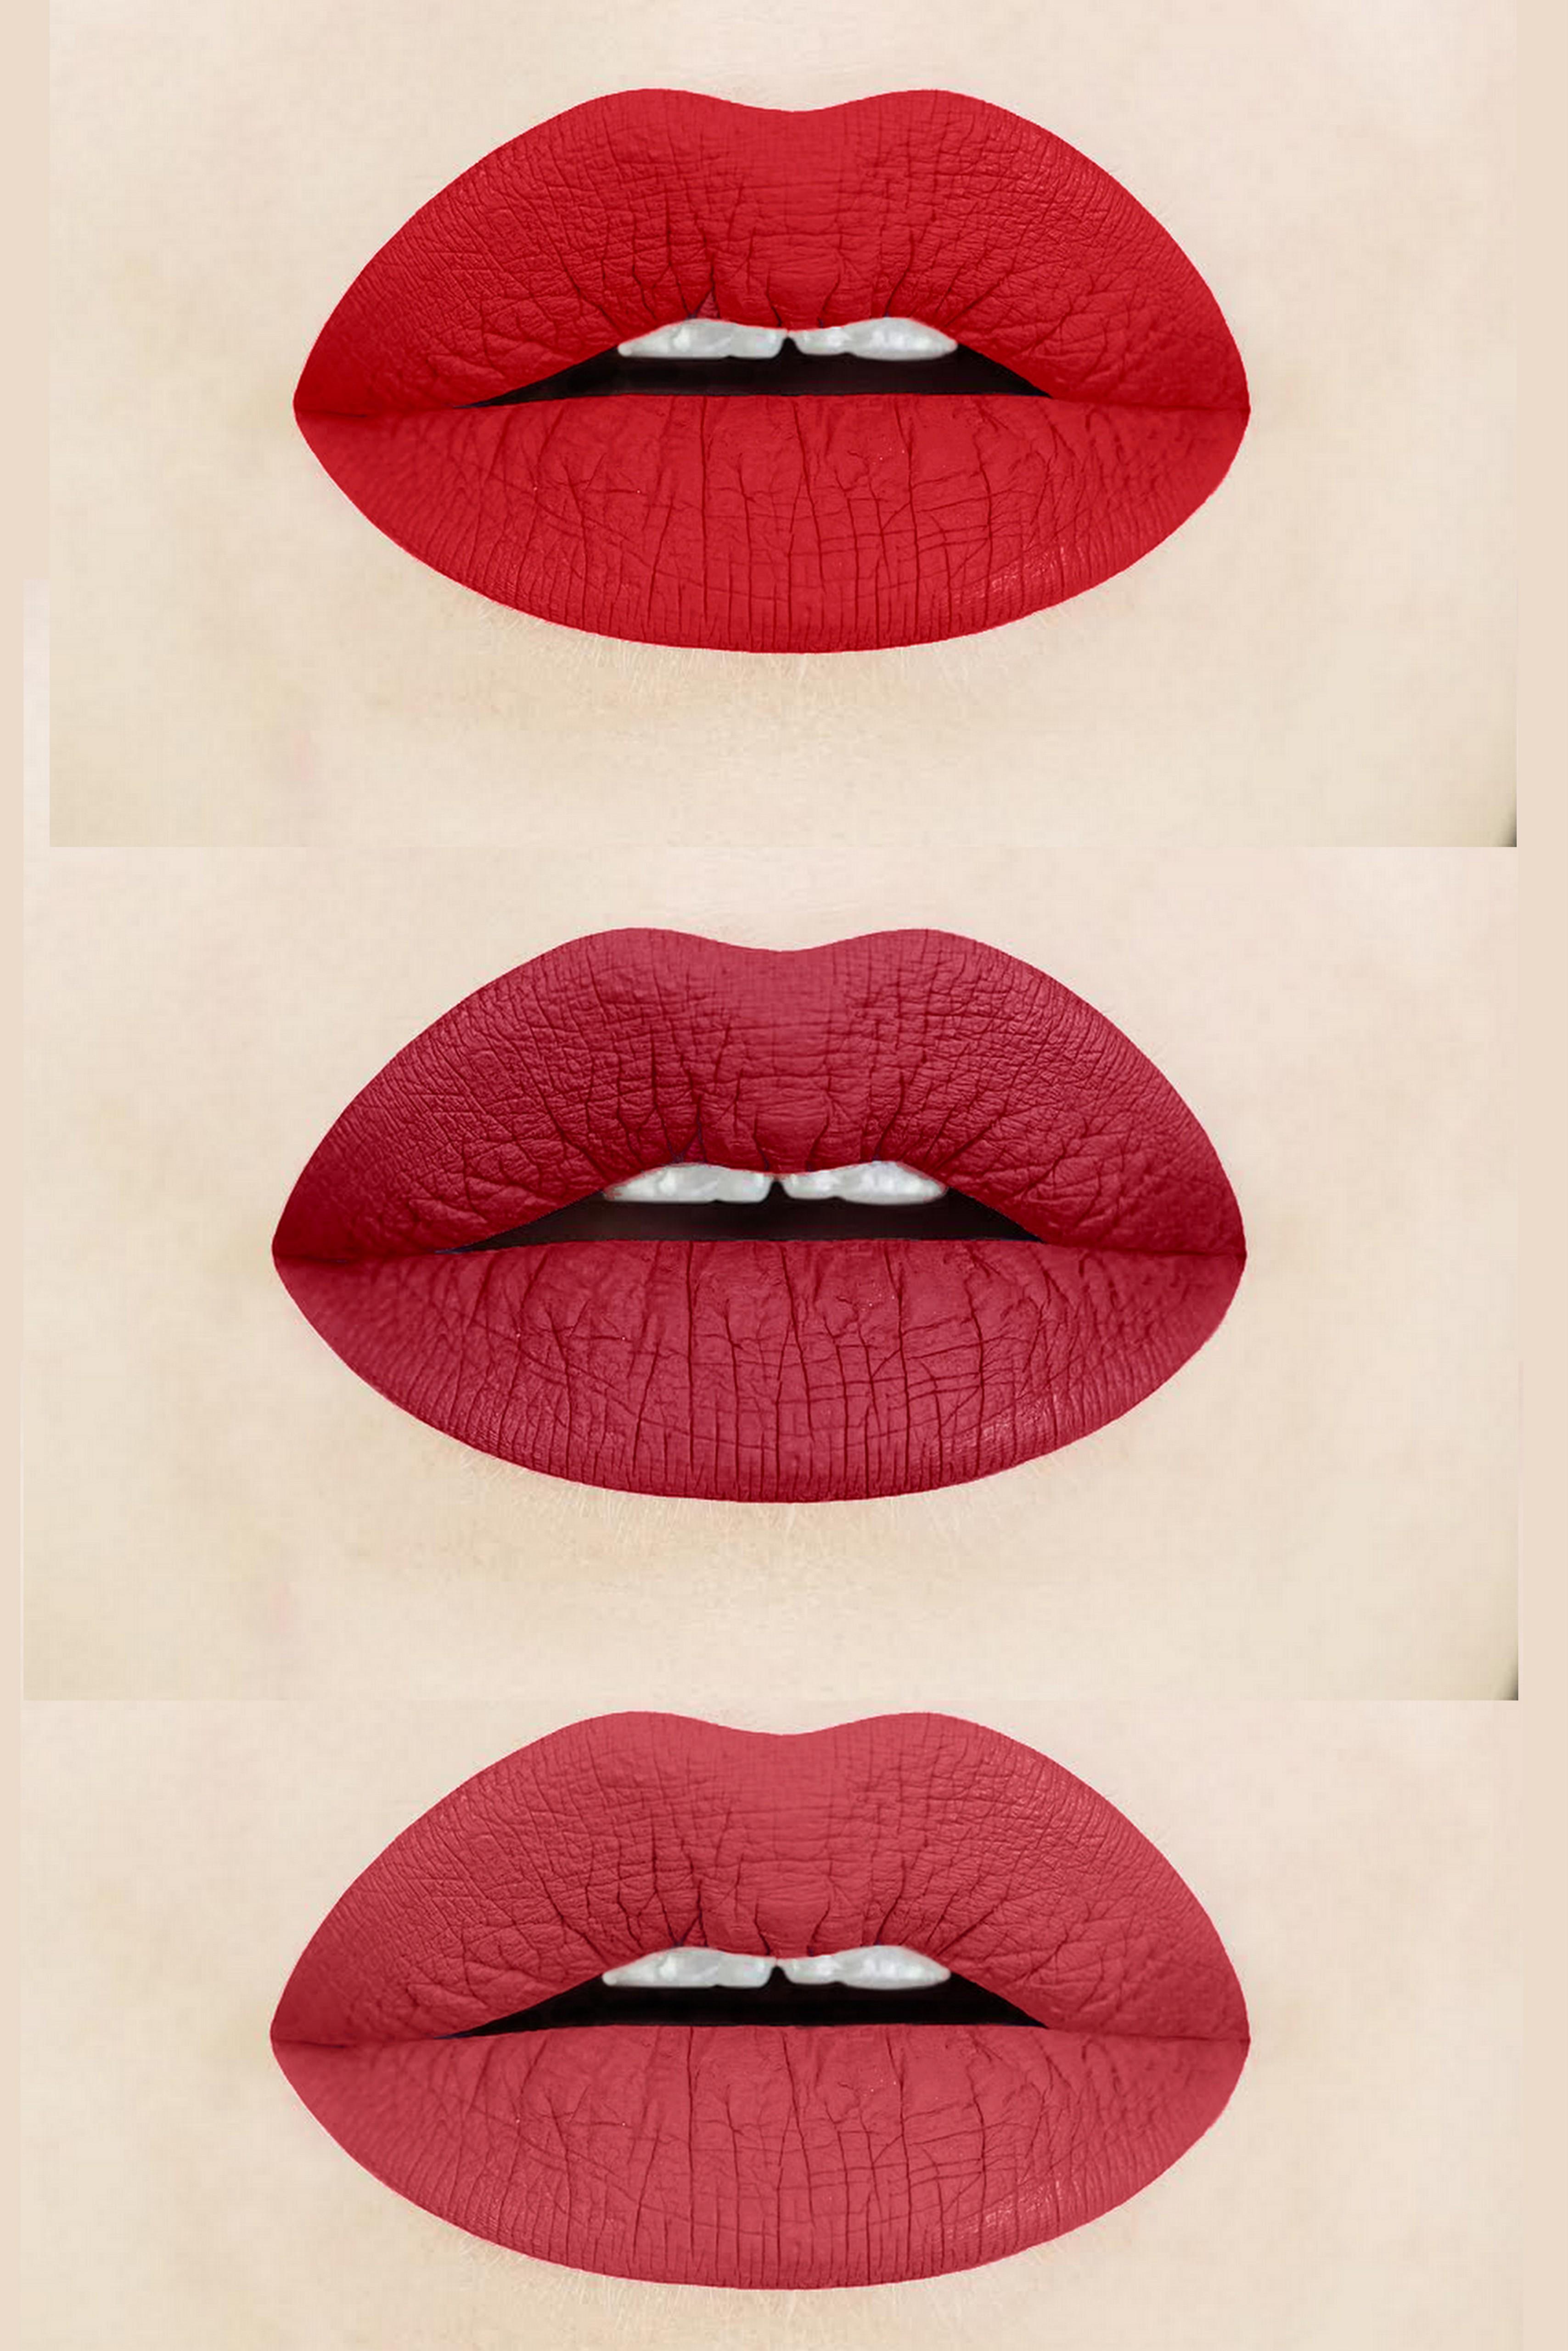 Aromi Beauty's Red Liquid Lipsticks - Flamenco, Power, & Brick Red